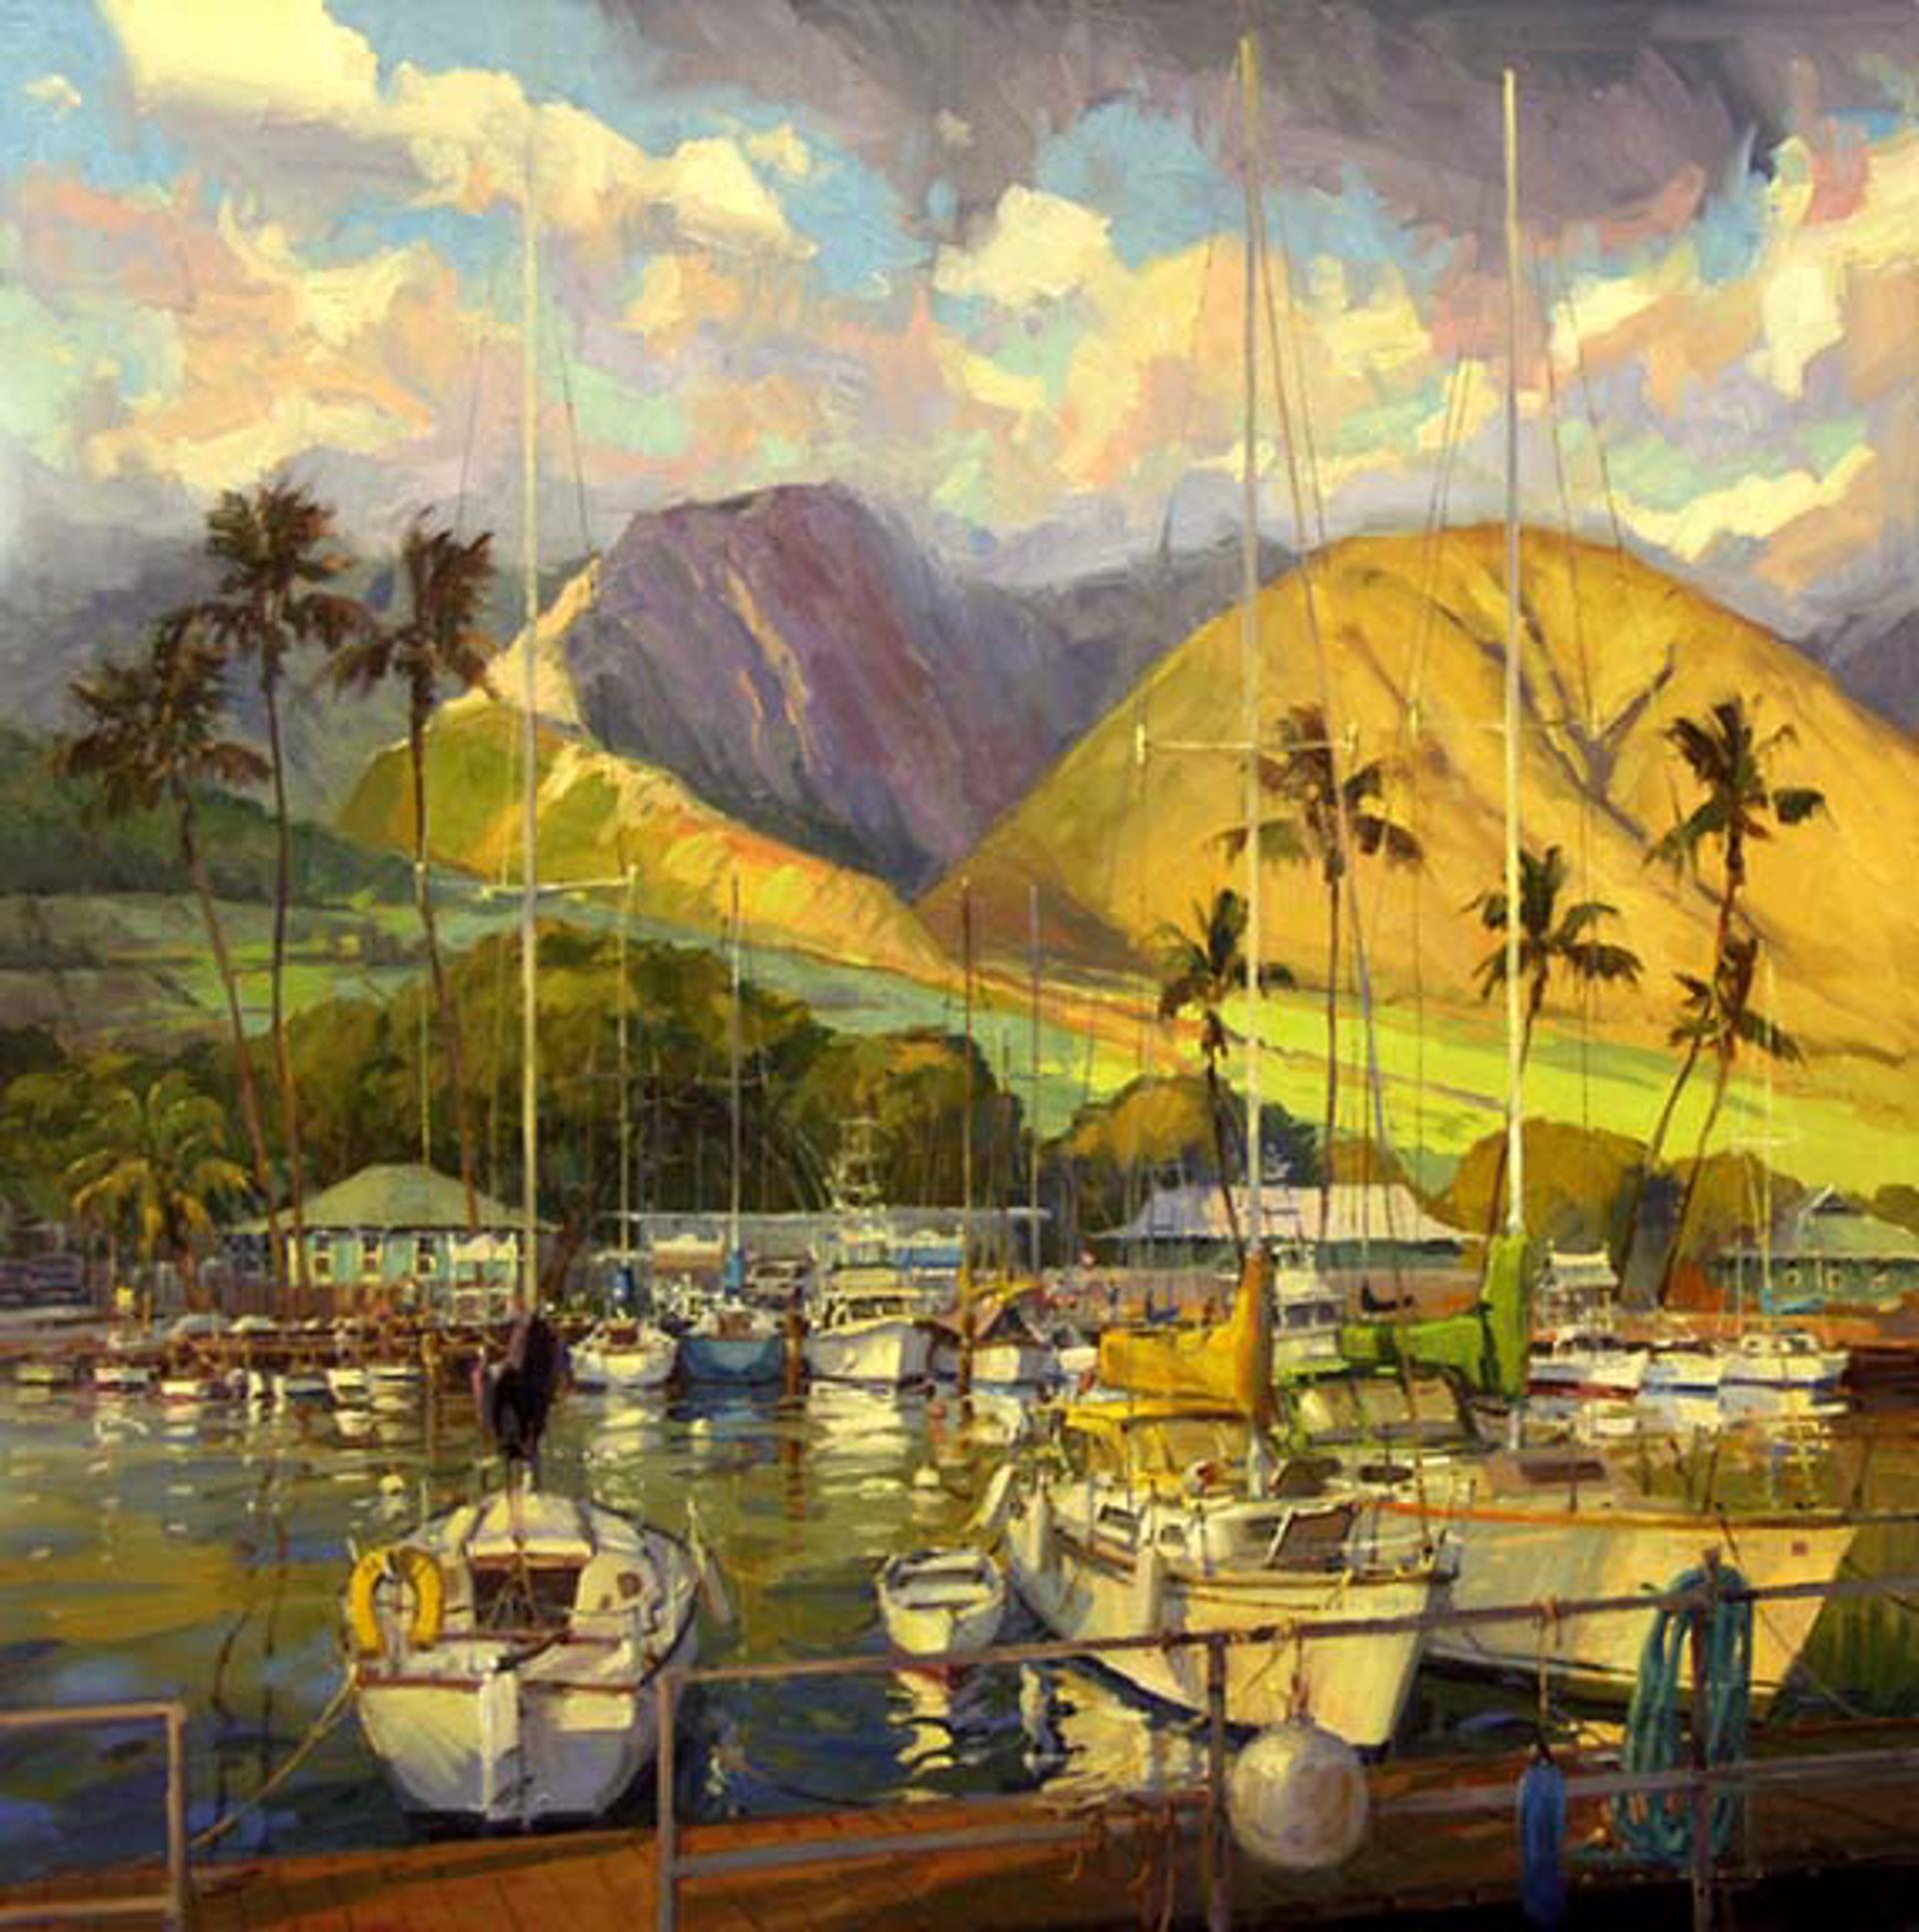 Golden Light On Lahaina Harbor by Ronaldo Macedo